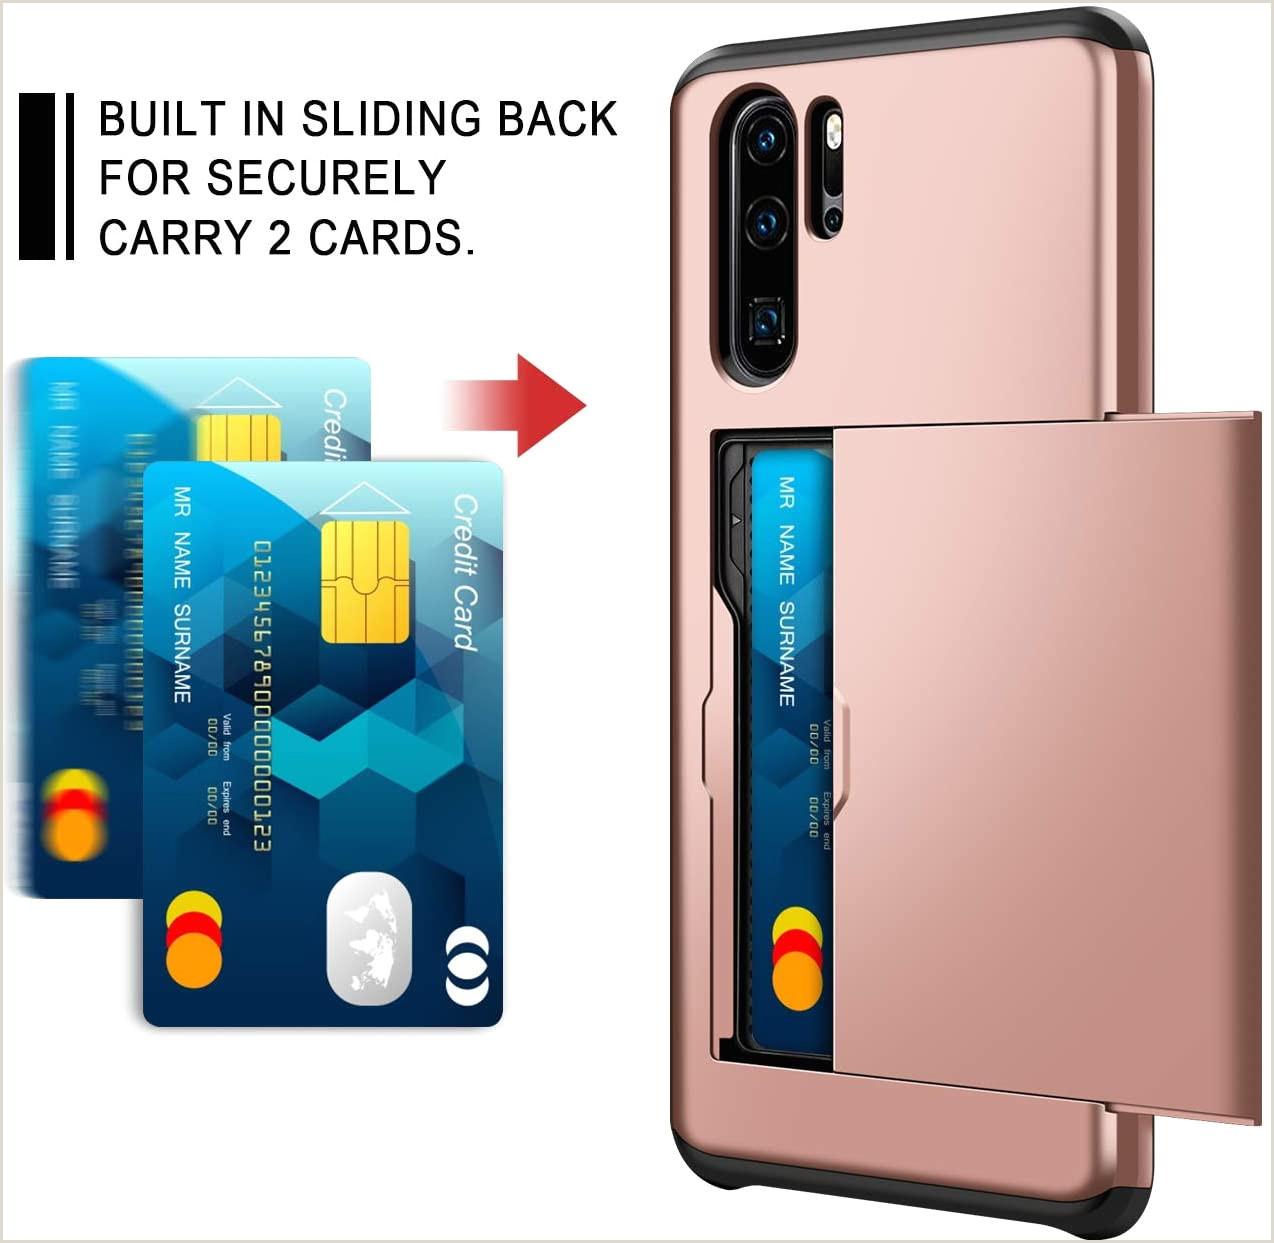 Business Card Back Coolden For Huawei P30 Pro Case Armor Shockproof Case For Huawei P30 Pro Wallet Case Cover Protective Case Rubber Bumper Card Holder Slot Wallet Case